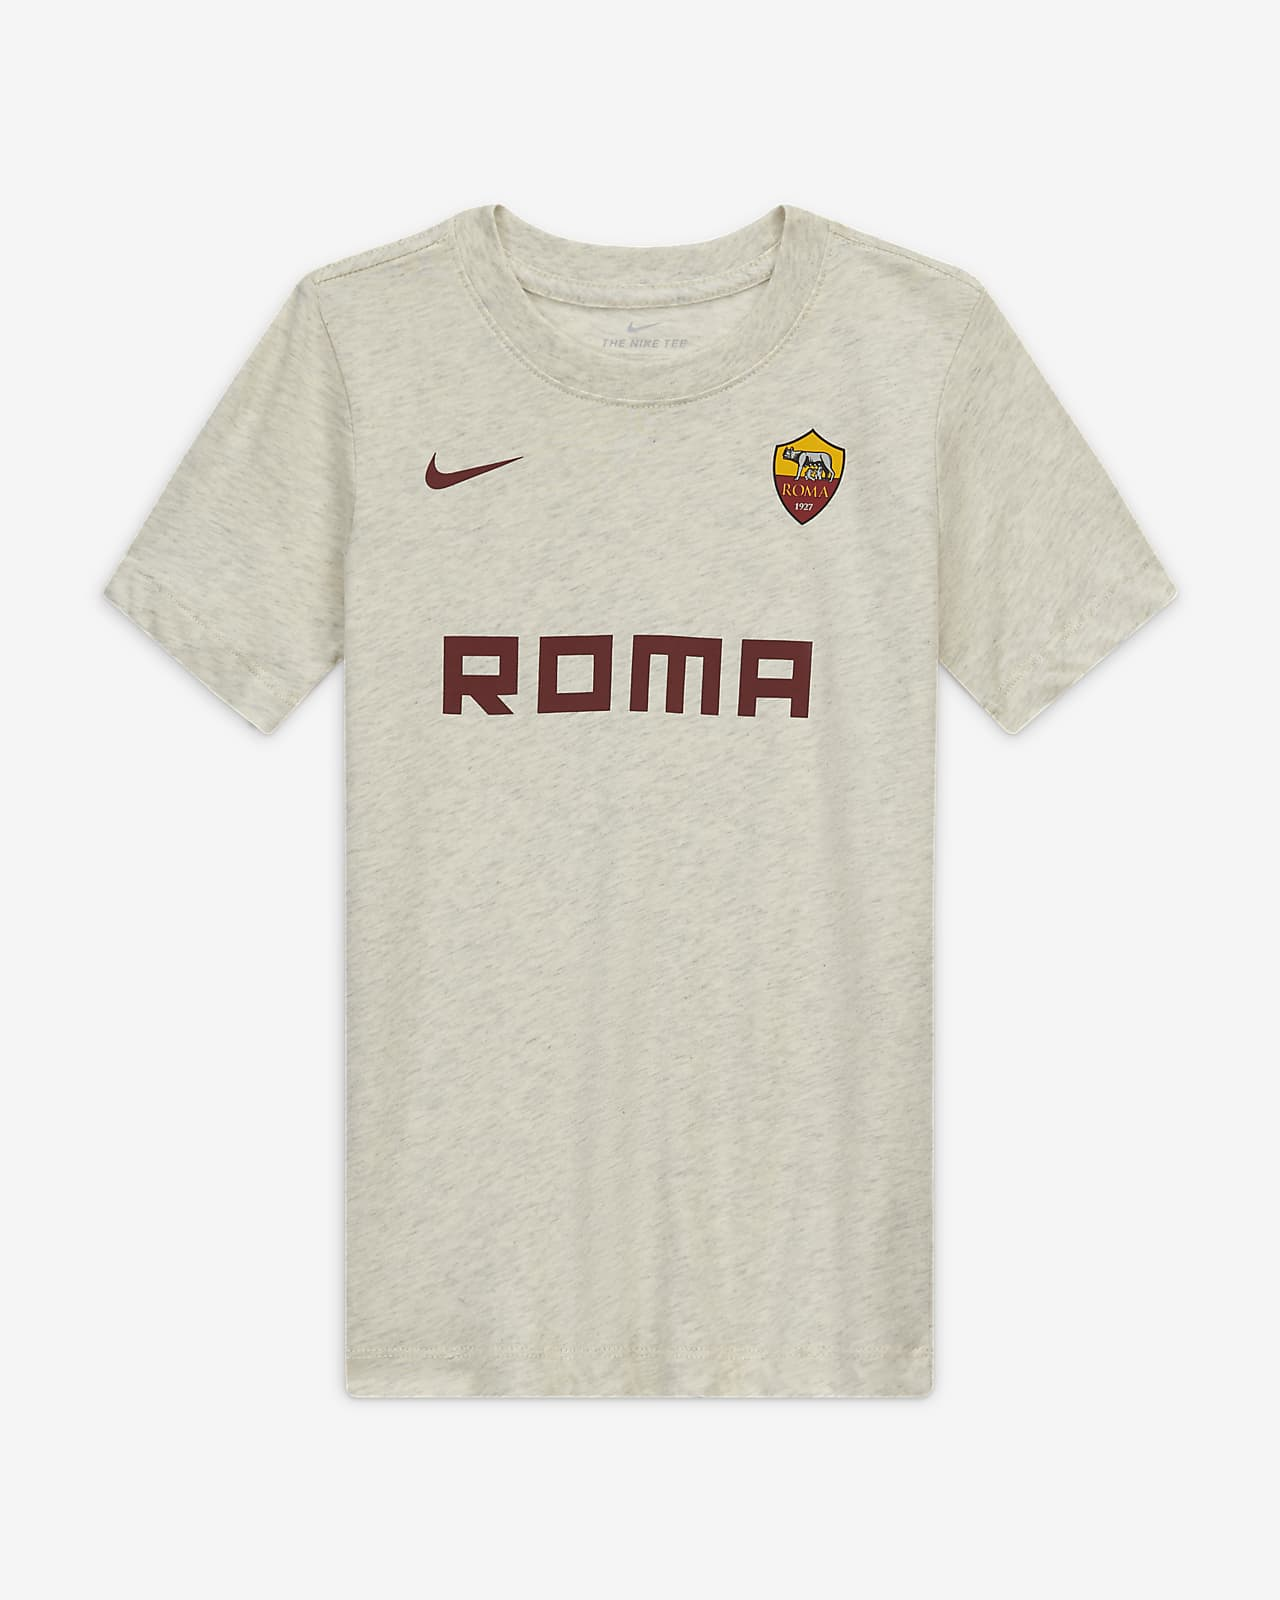 AS Roma Older Kids' Football T-Shirt